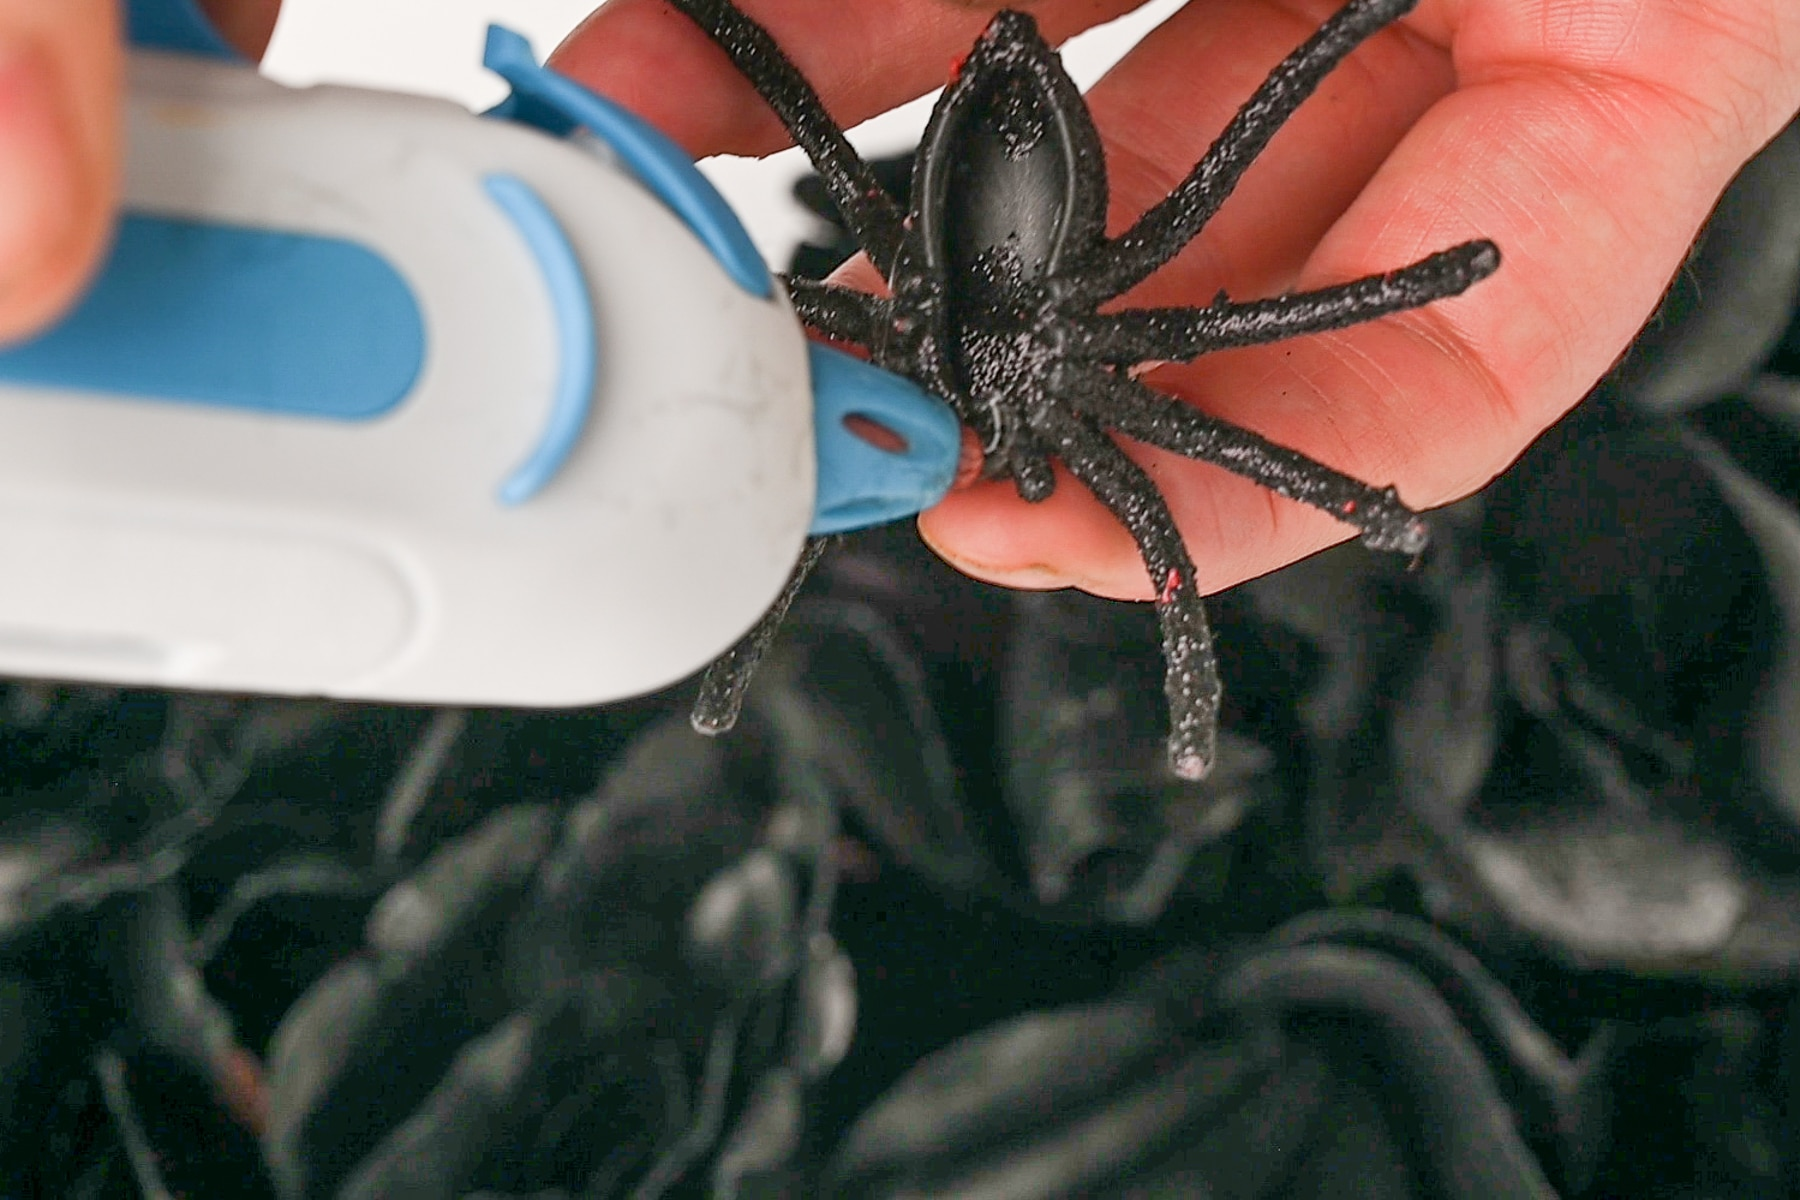 Glue gun with a plastic fake spider